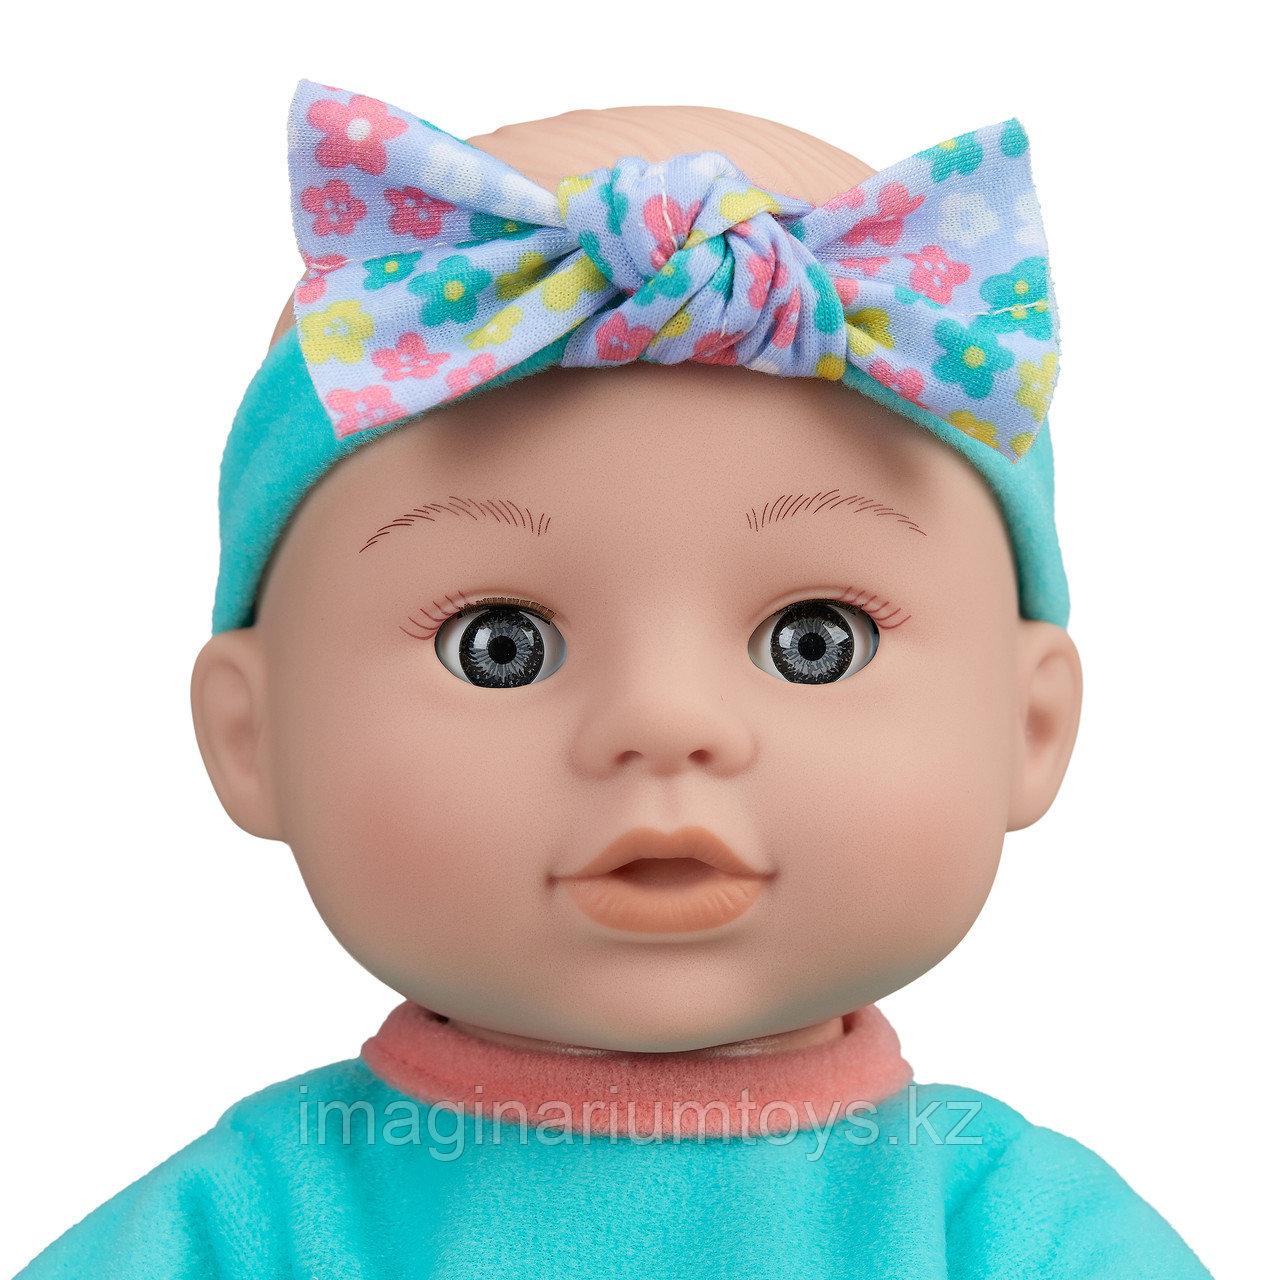 Кукла пупс с комплектом одежды My Sweet Love - фото 2